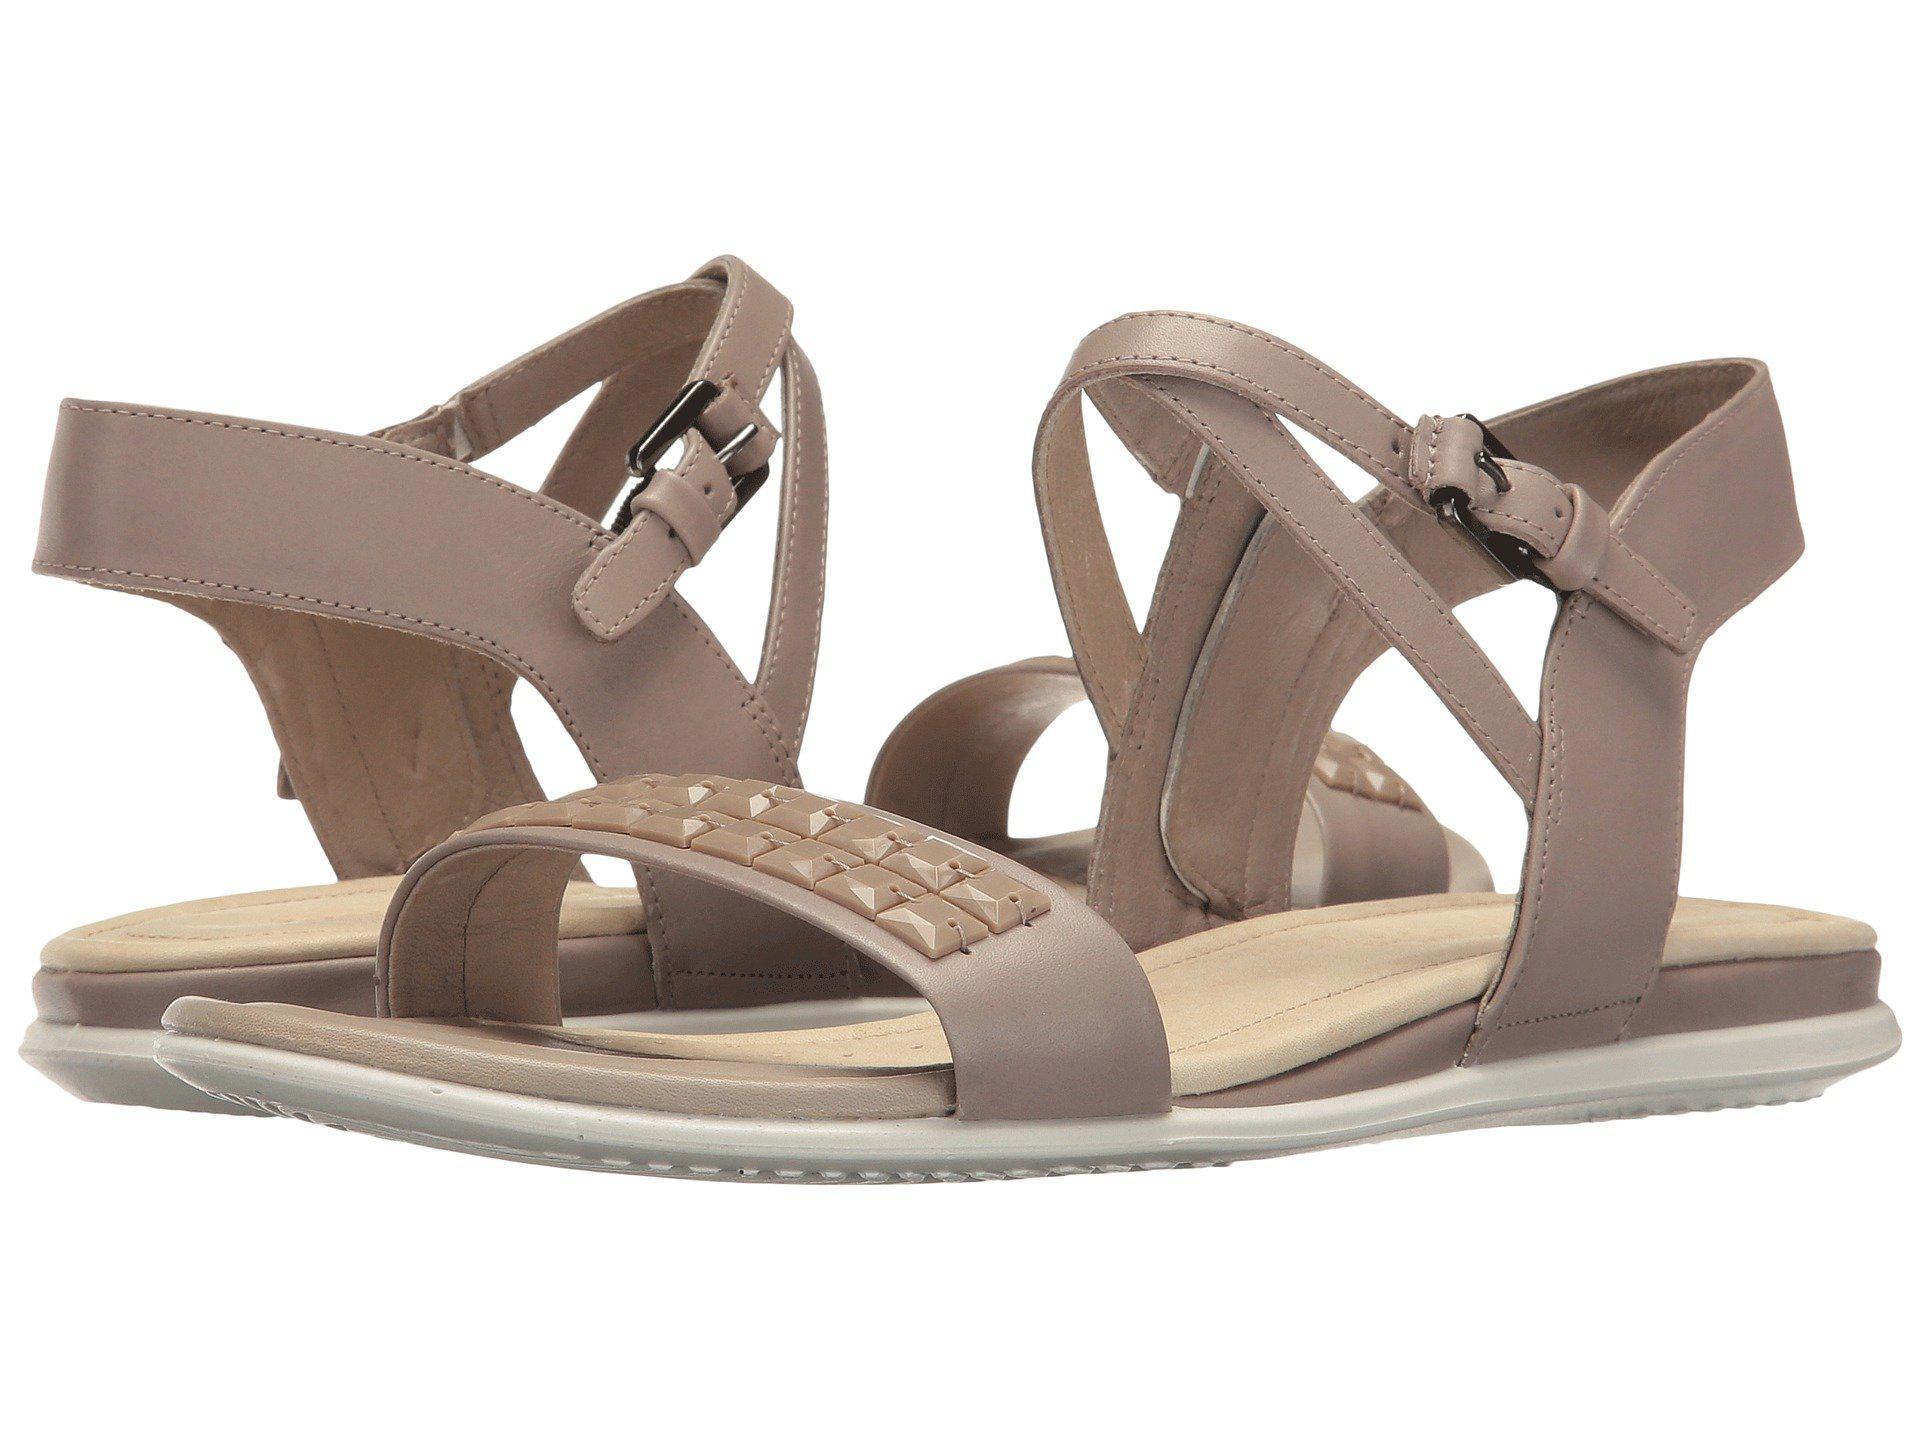 91a5bb951e5e Lyst - Ecco  s Touch Sandal Dress